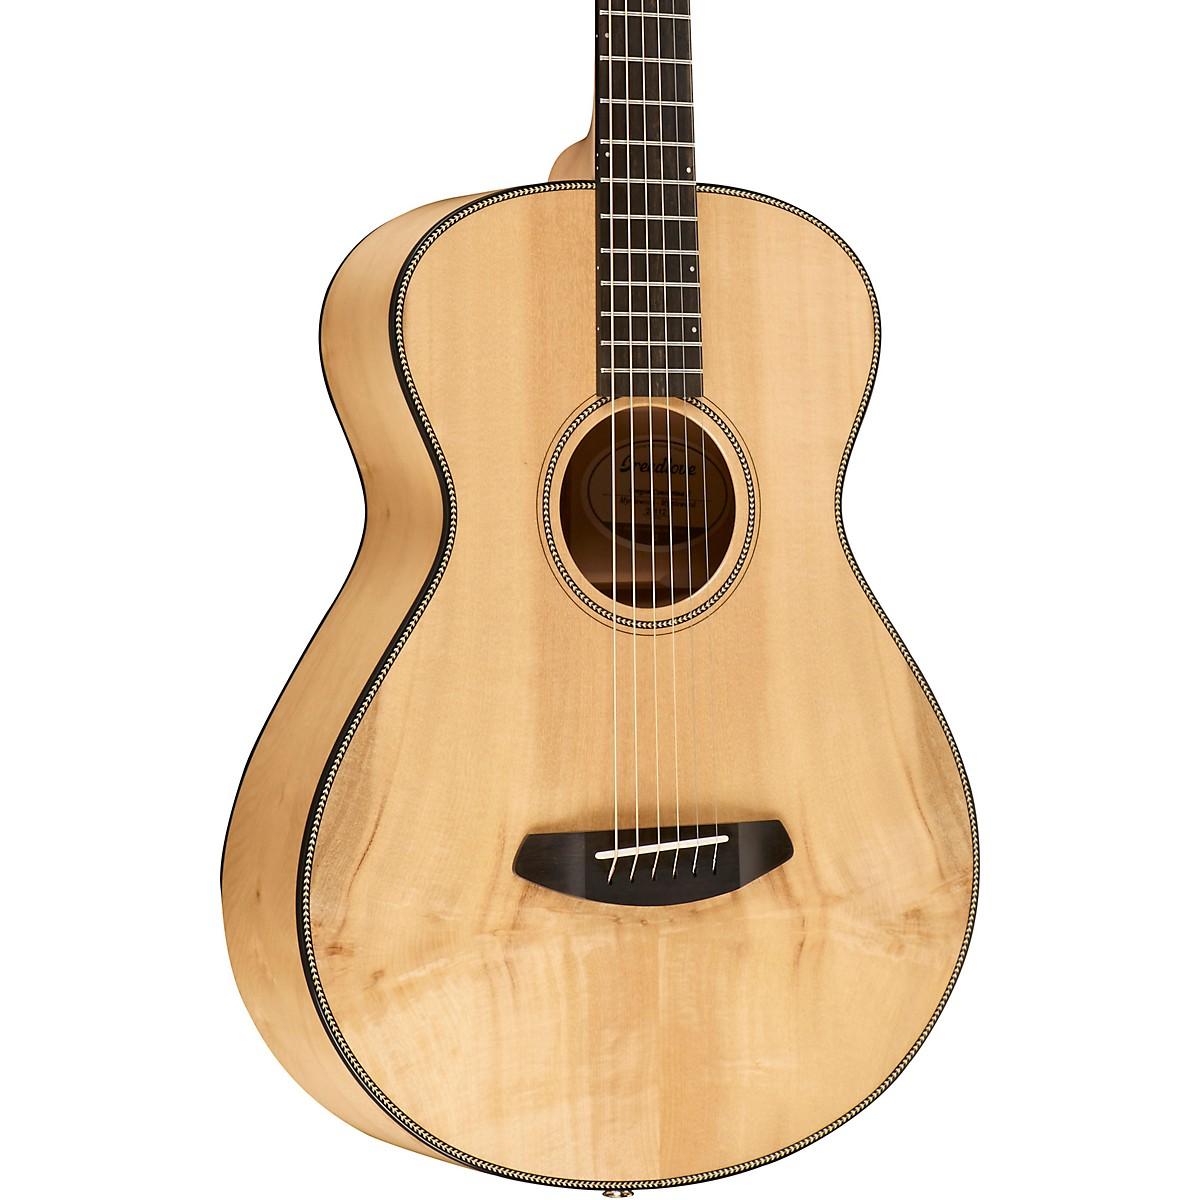 Breedlove Oregon Concertina Myrtlewood Acoustic-Electric Guitar